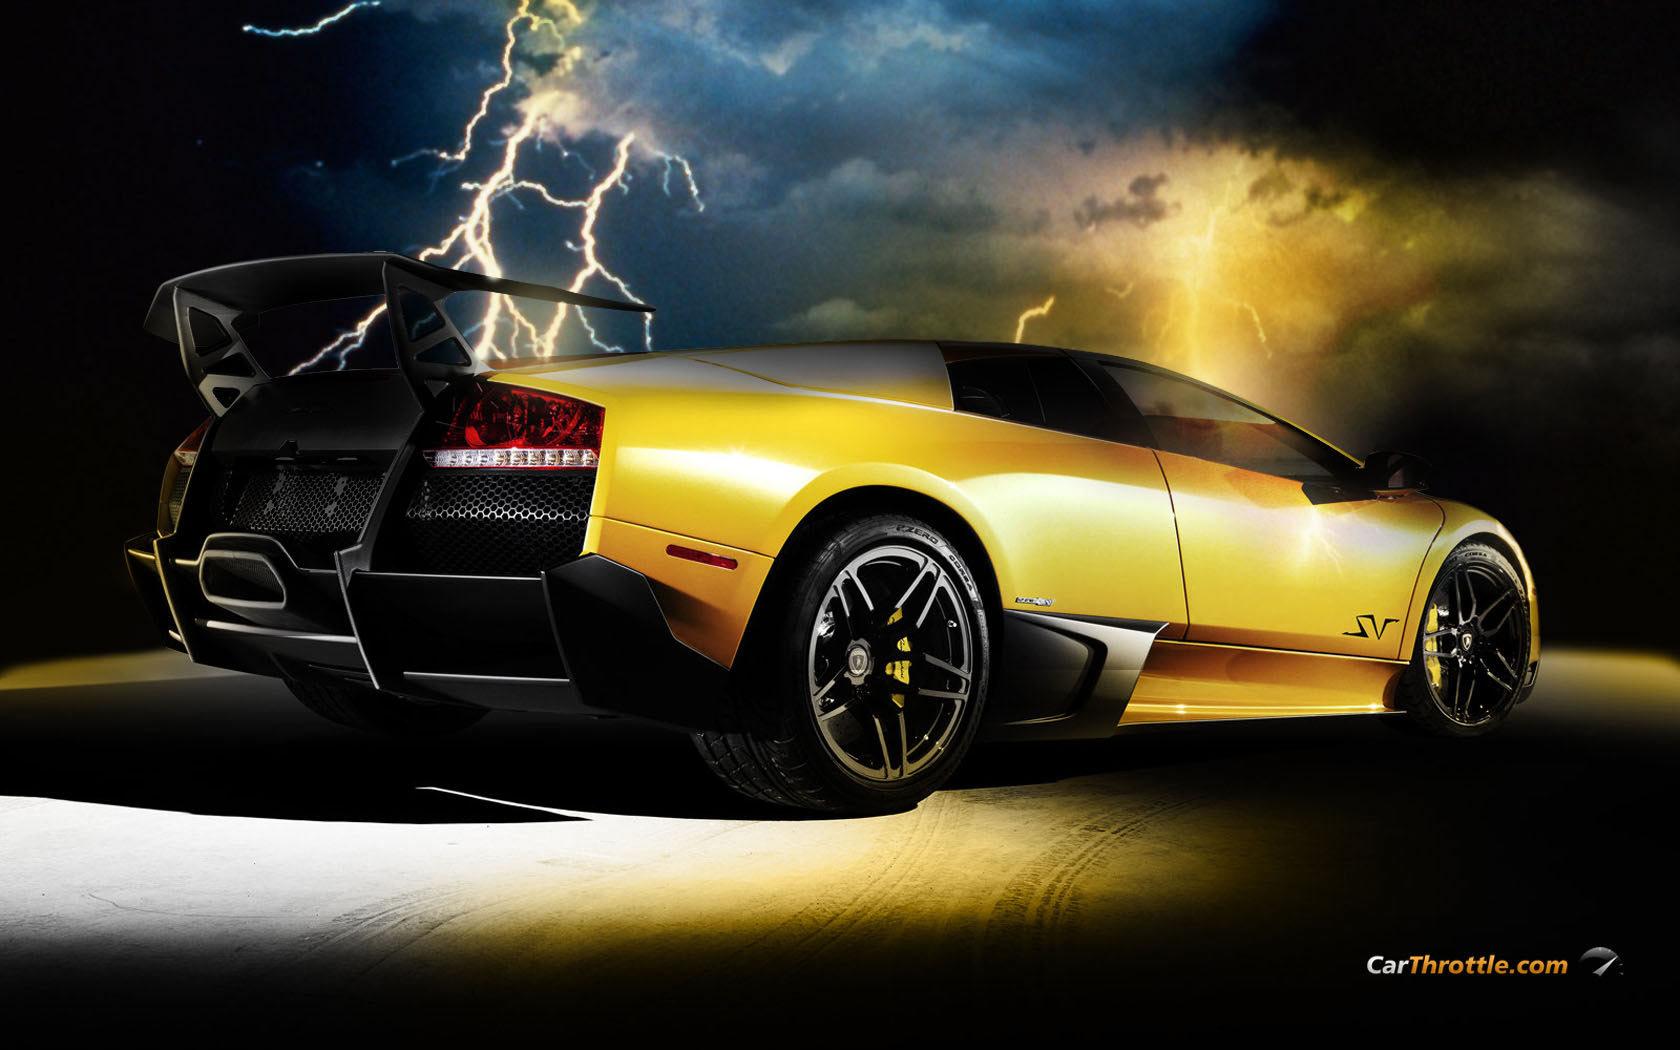 Download Hd 1680x1050 Lamborghini Murcielago Computer Wallpaper ID:155300  For Free